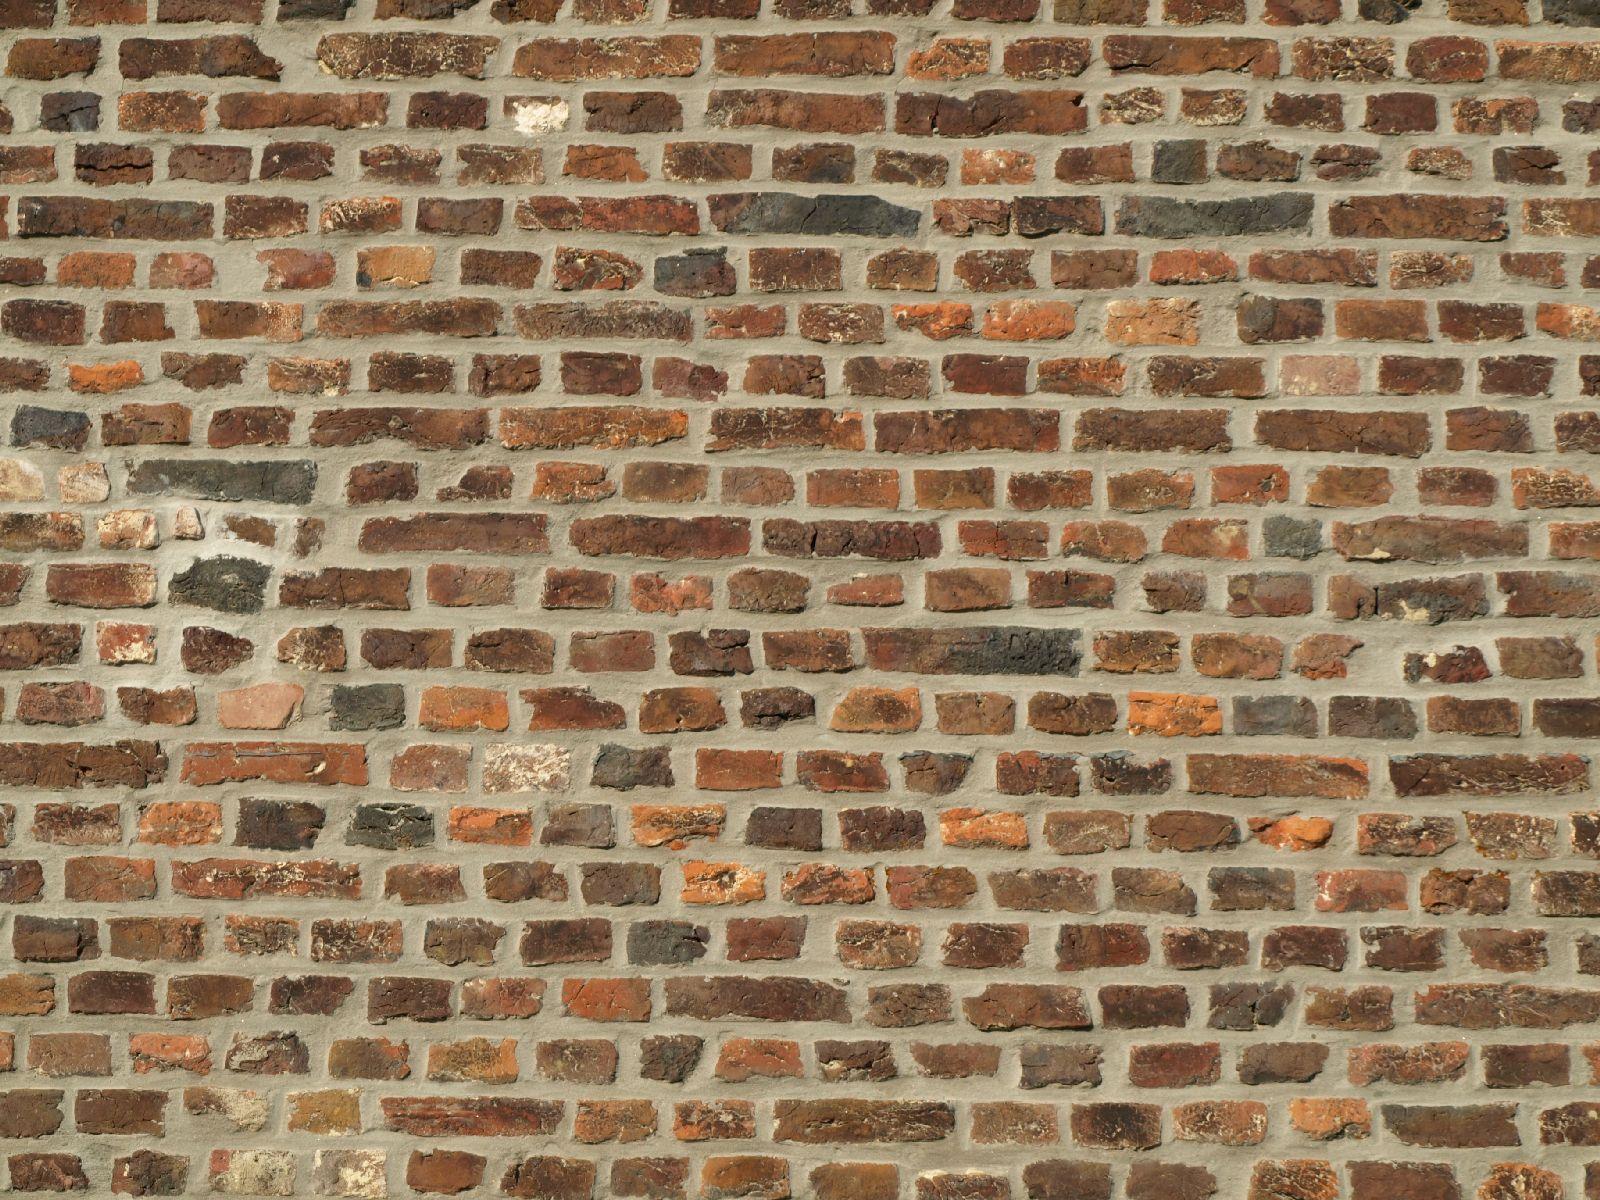 Wand-Mauerwerk-Backstein_Textur_A_P9205306